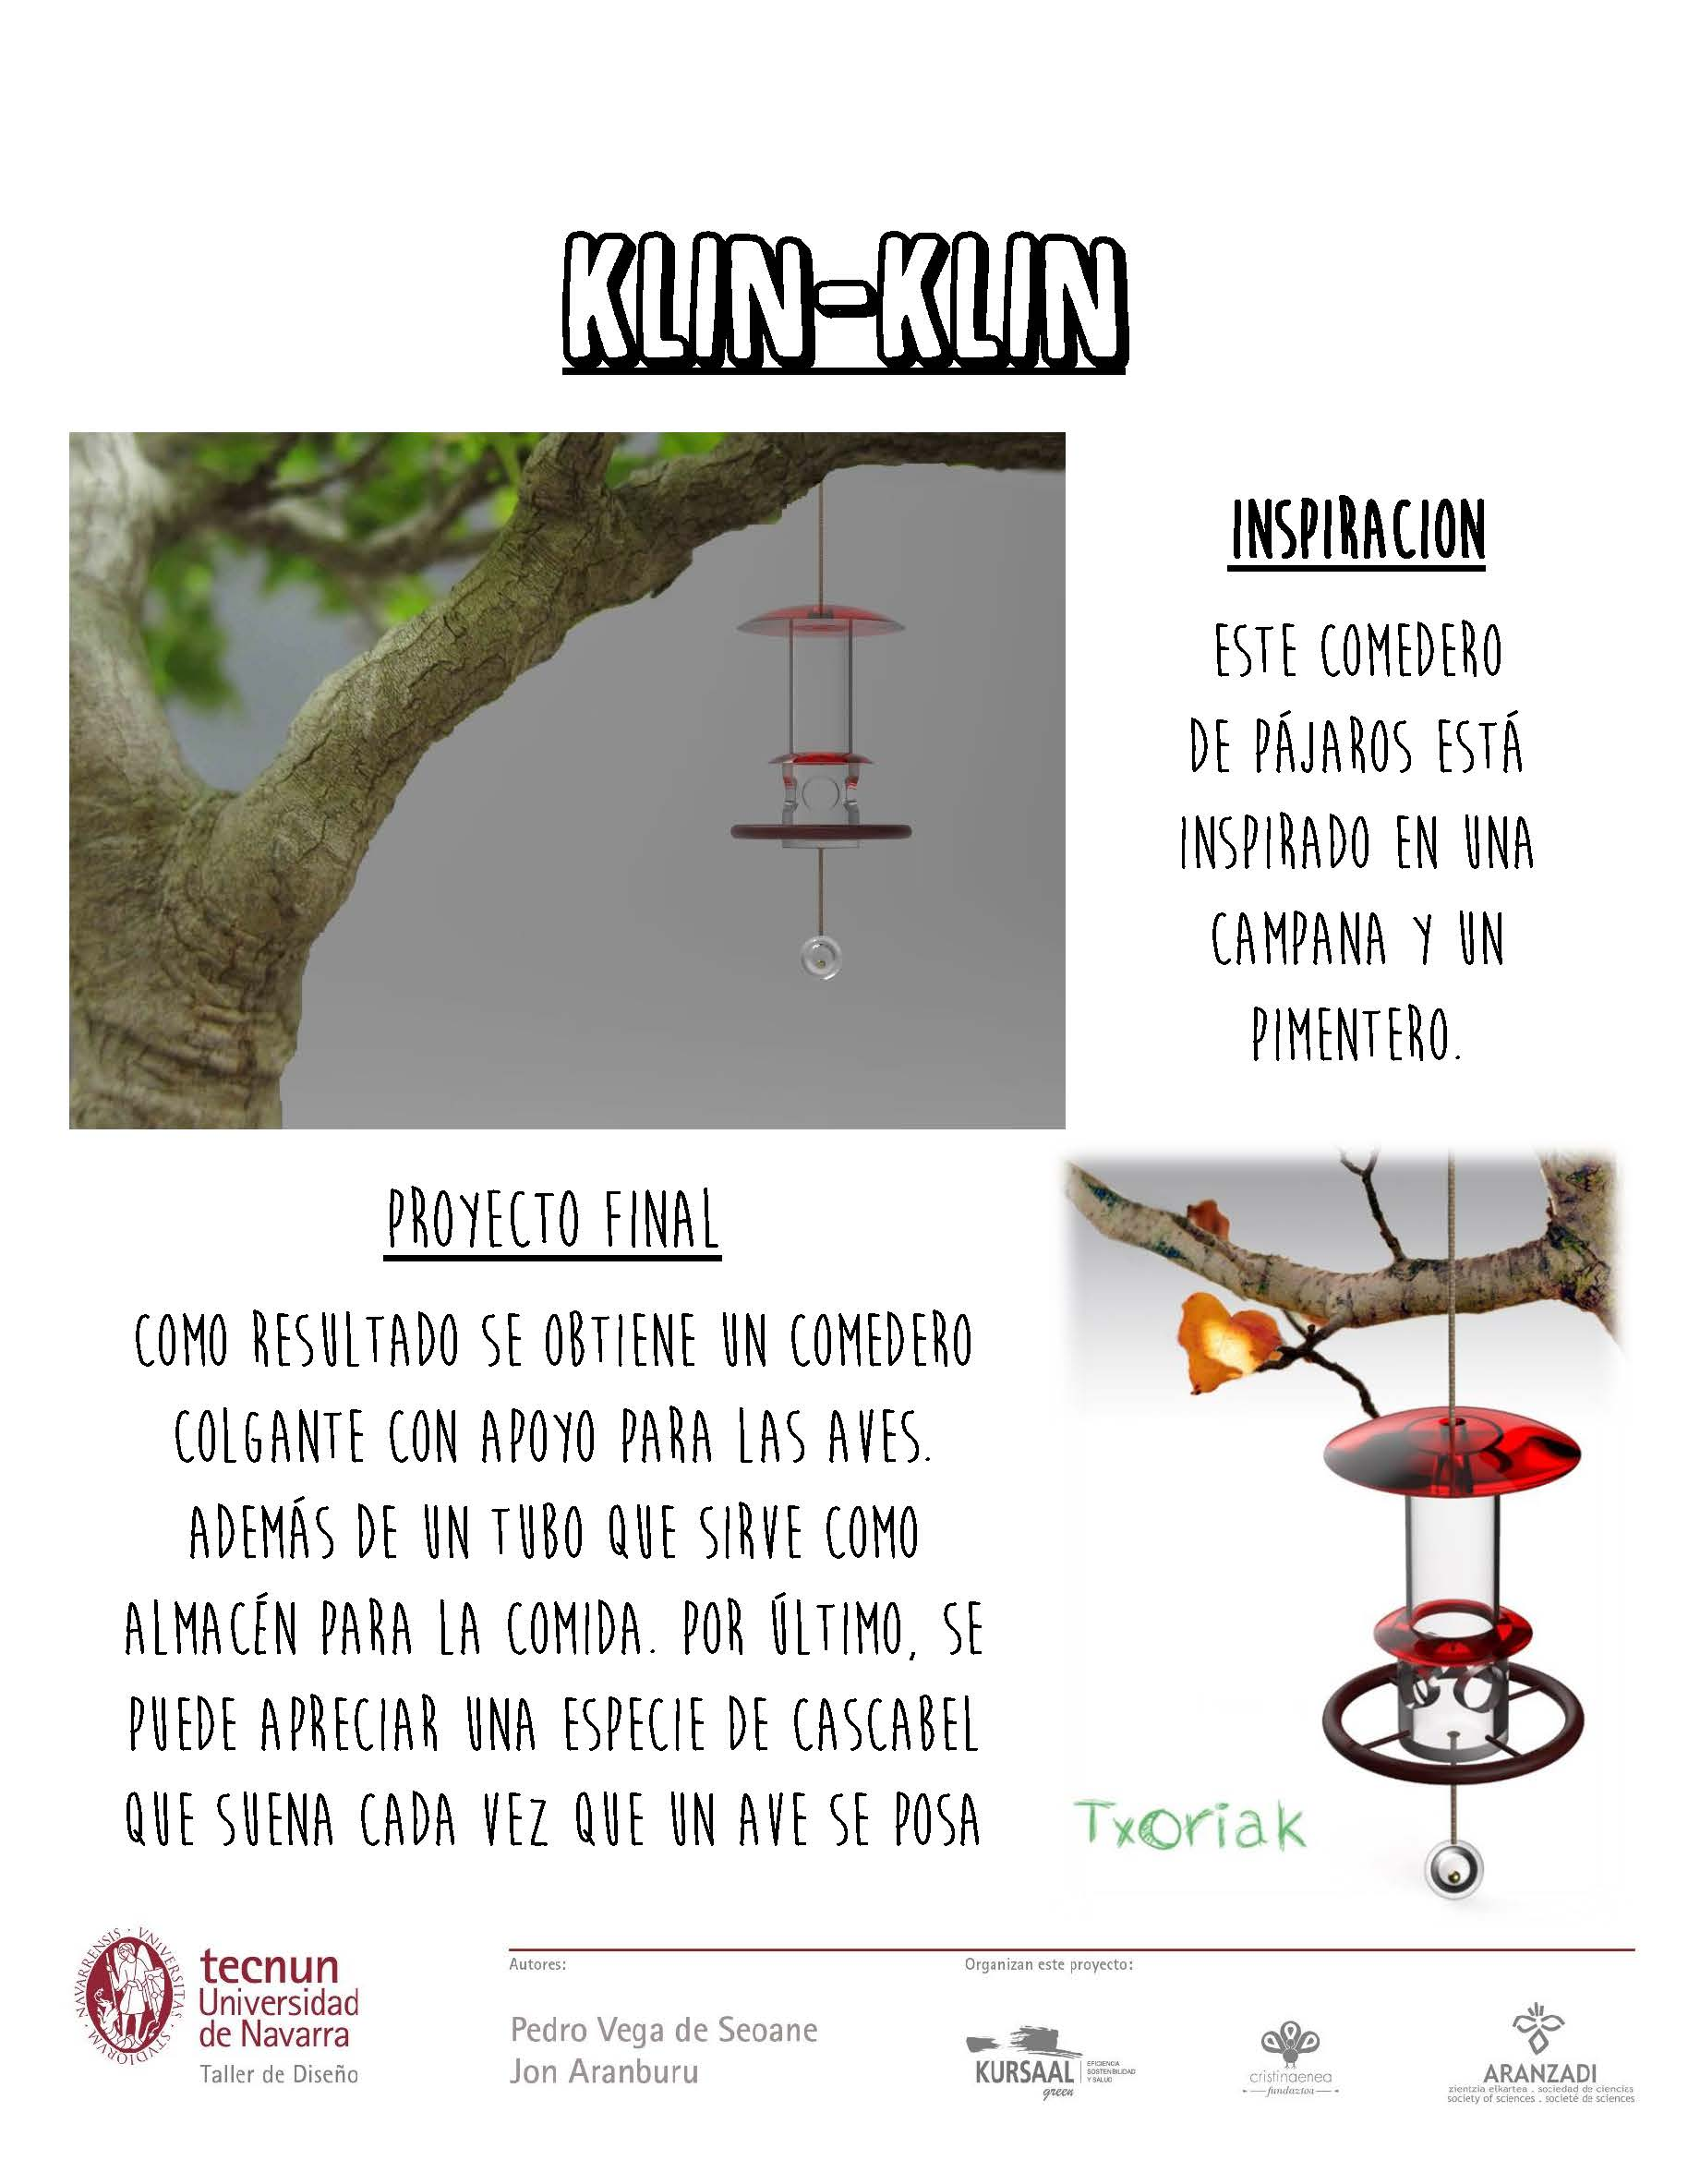 Taller de diseño - Tecnum - Txoriak - KLIN KLIN